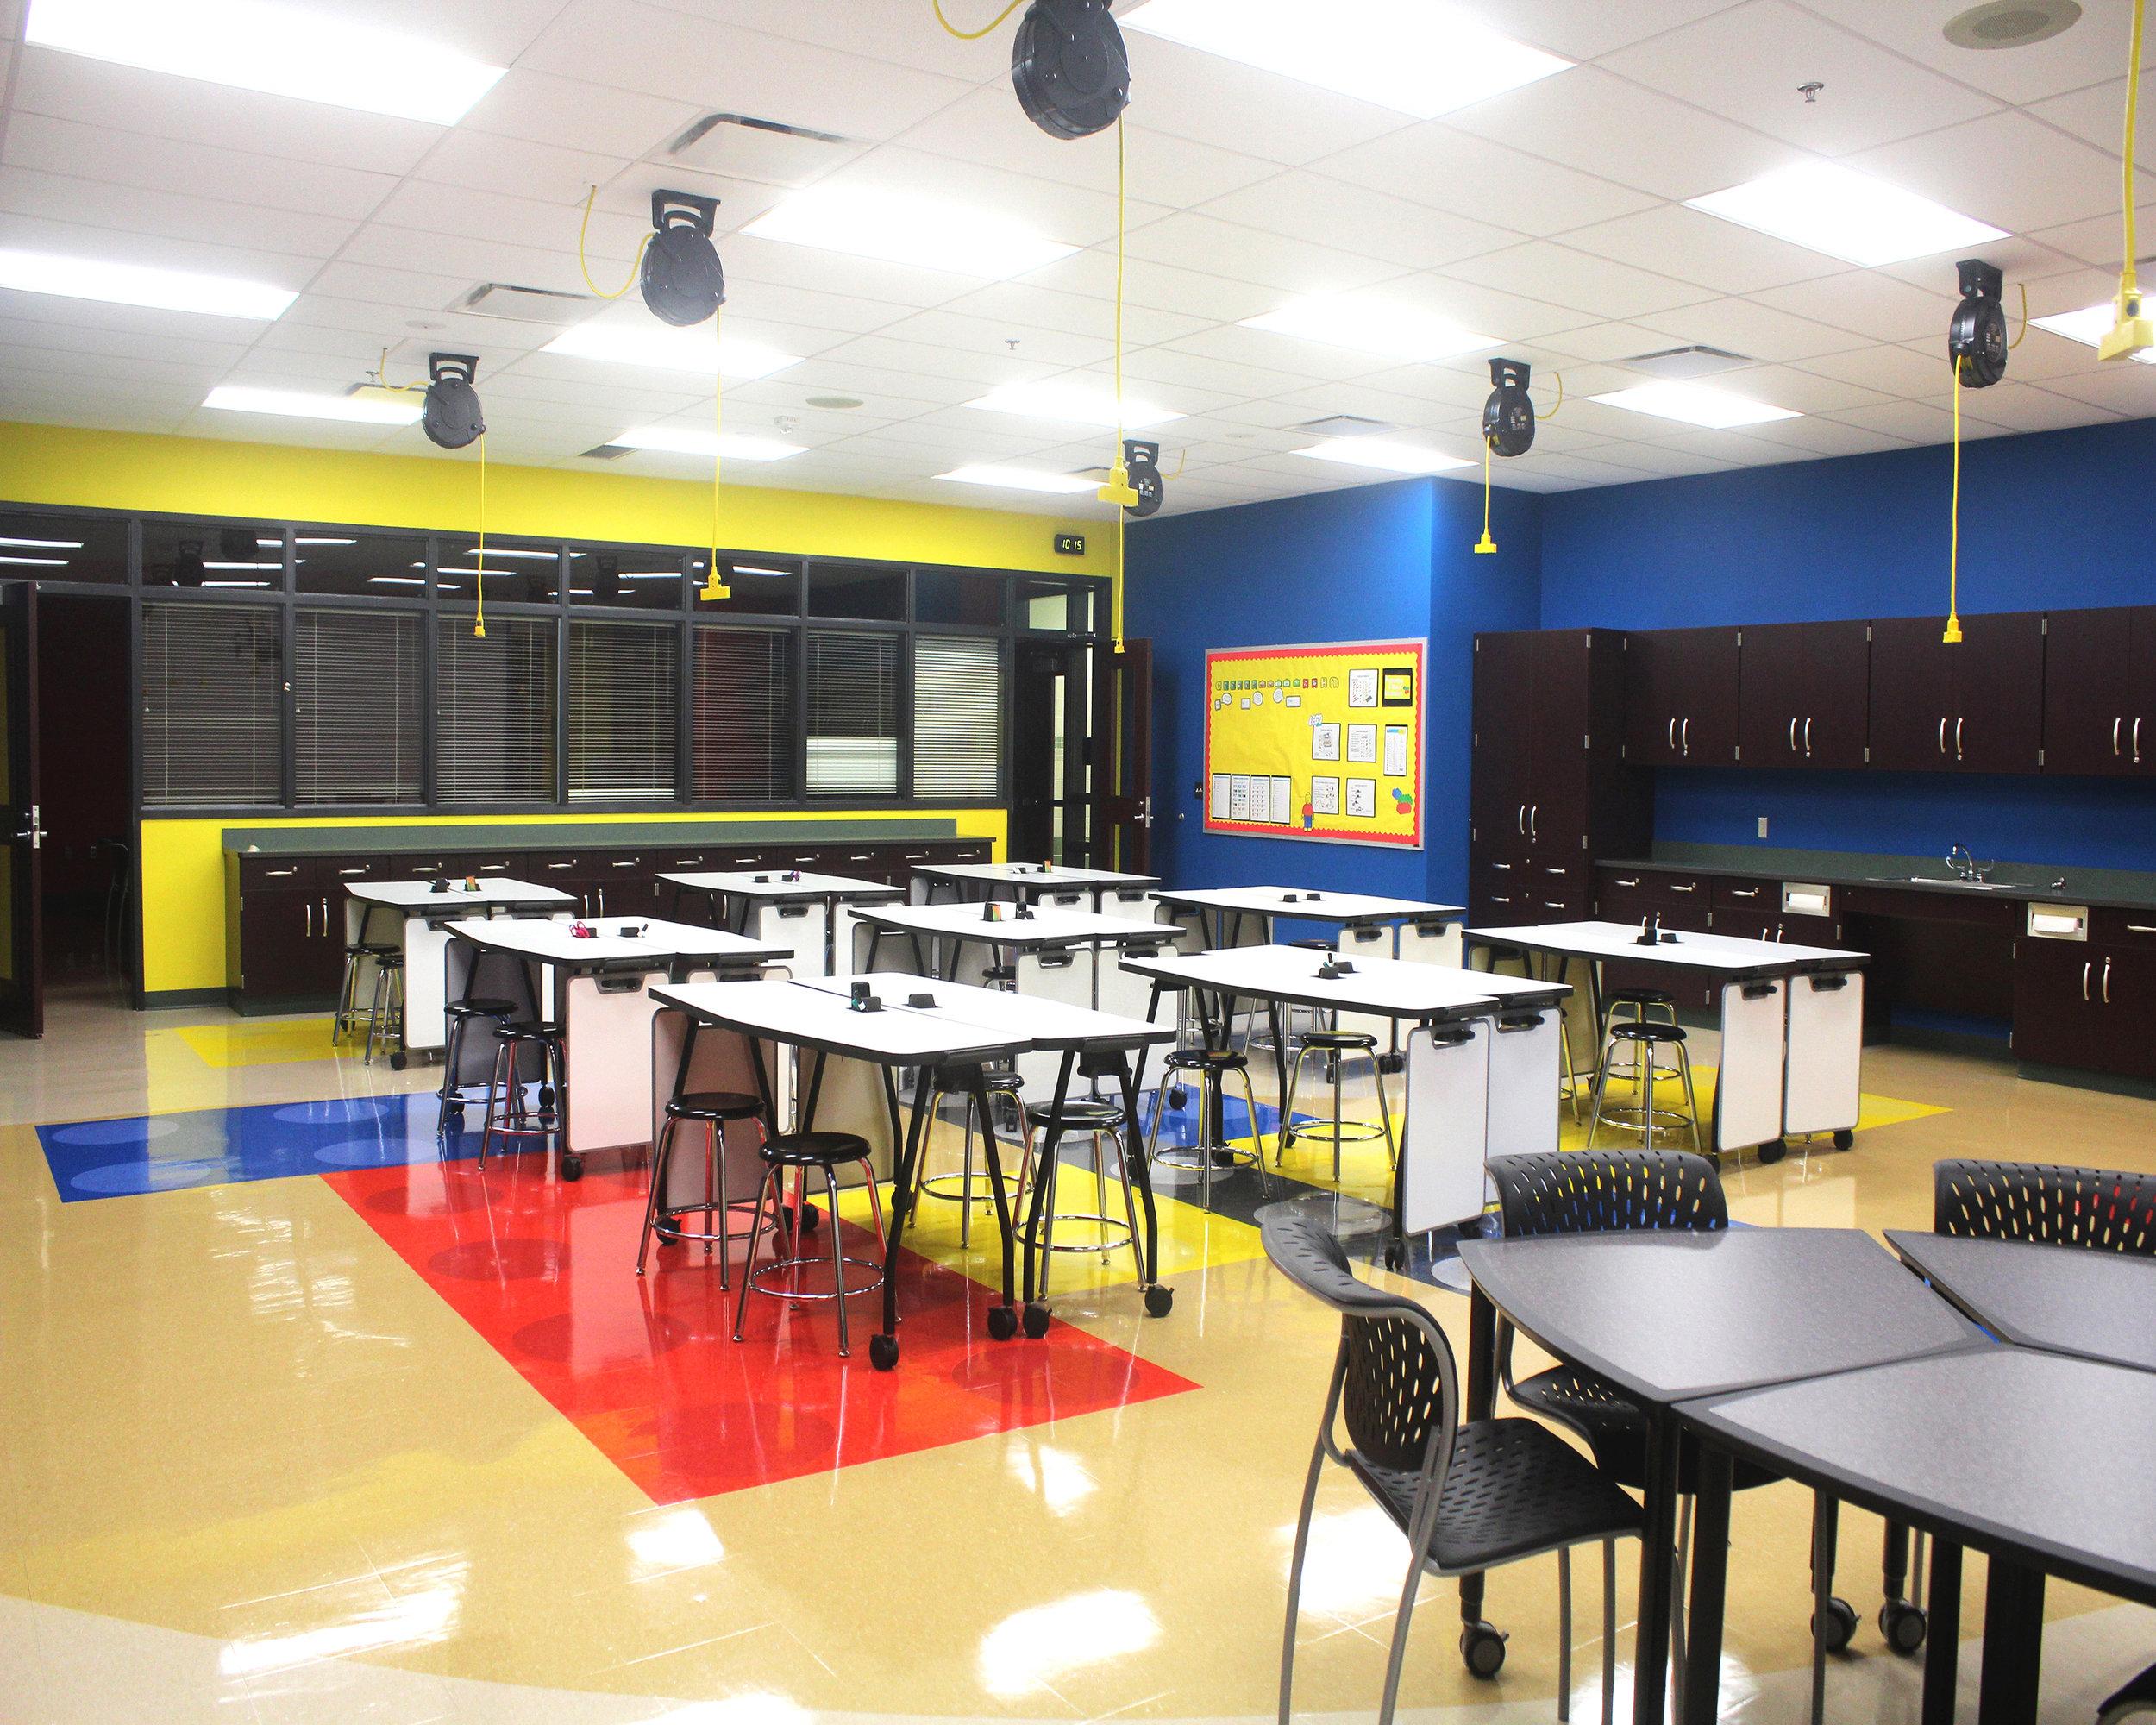 South Fayette Intermediate School  South Fayette Township School District   Education